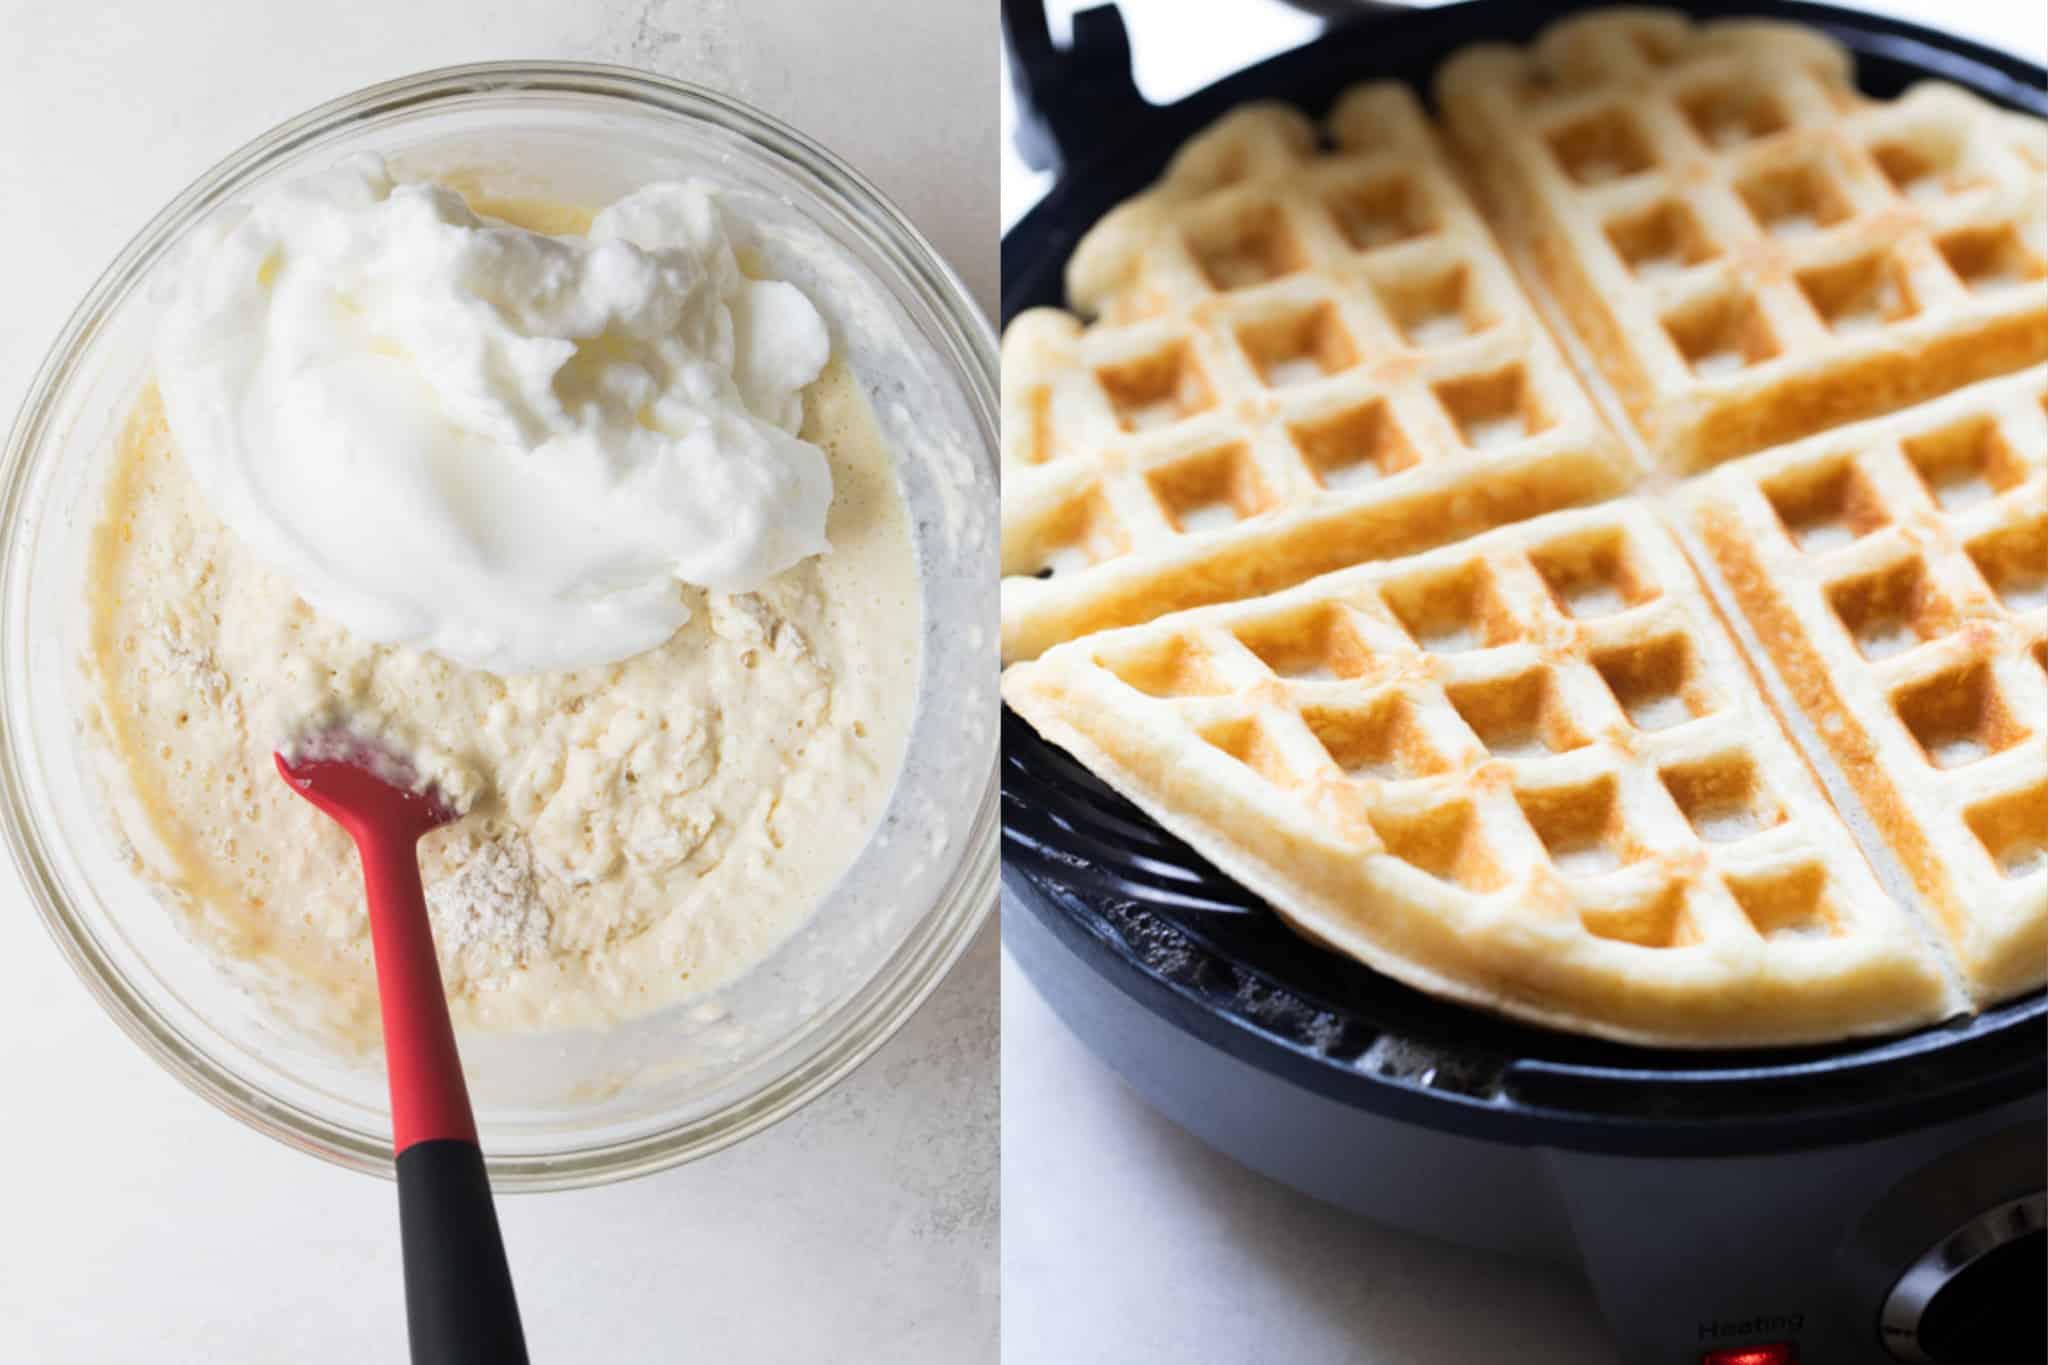 photos of making waffles